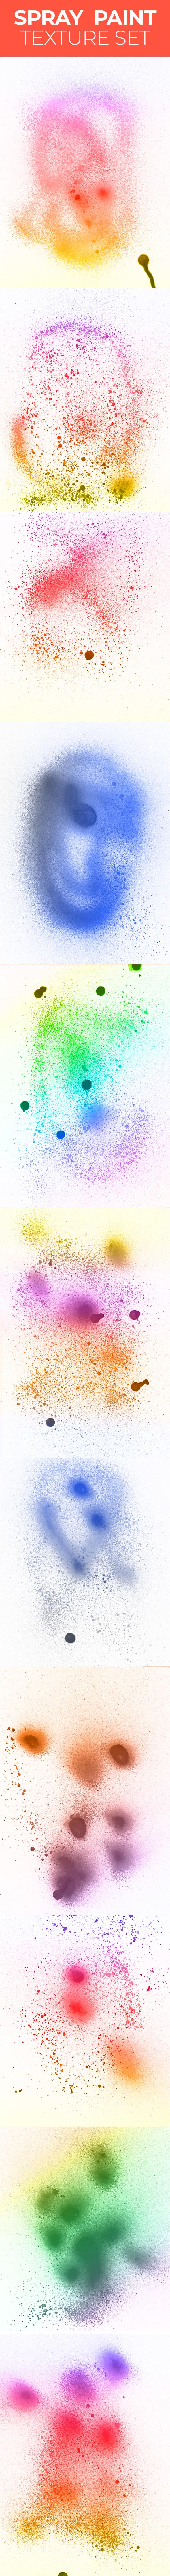 spray paint texture set 10 Hi res spray paint textures